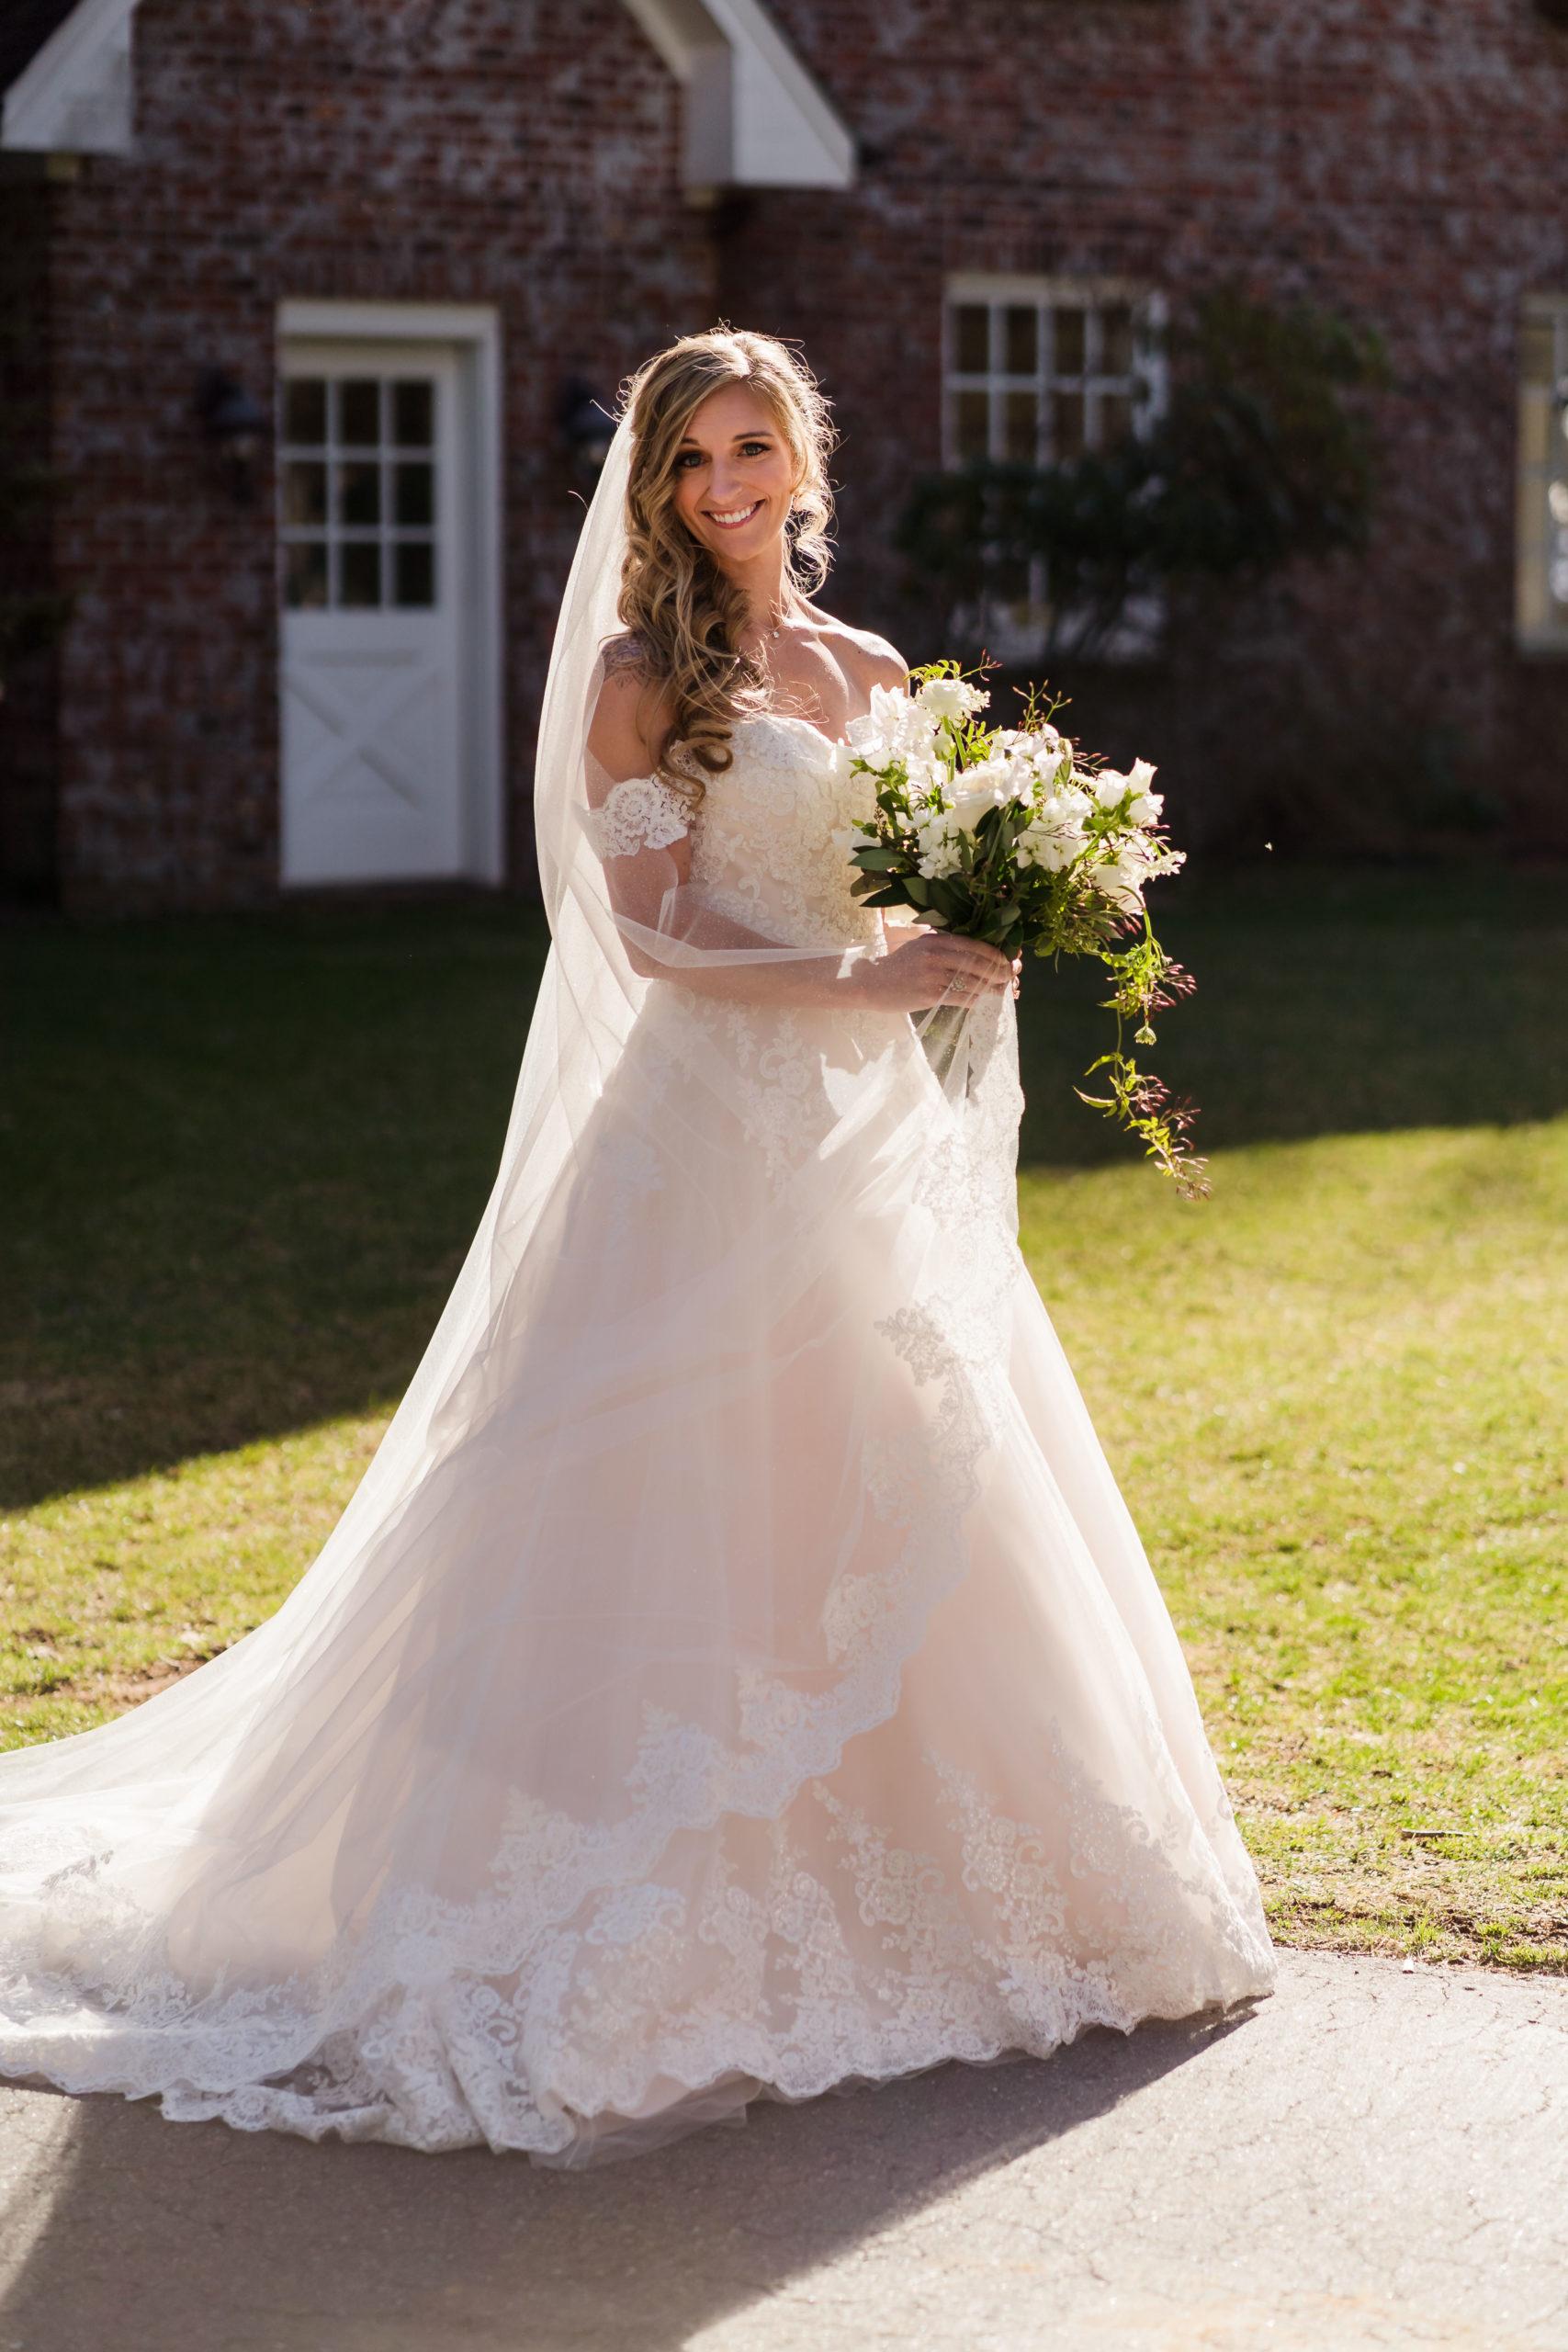 Formal Bridal Portrait at Twickenham House